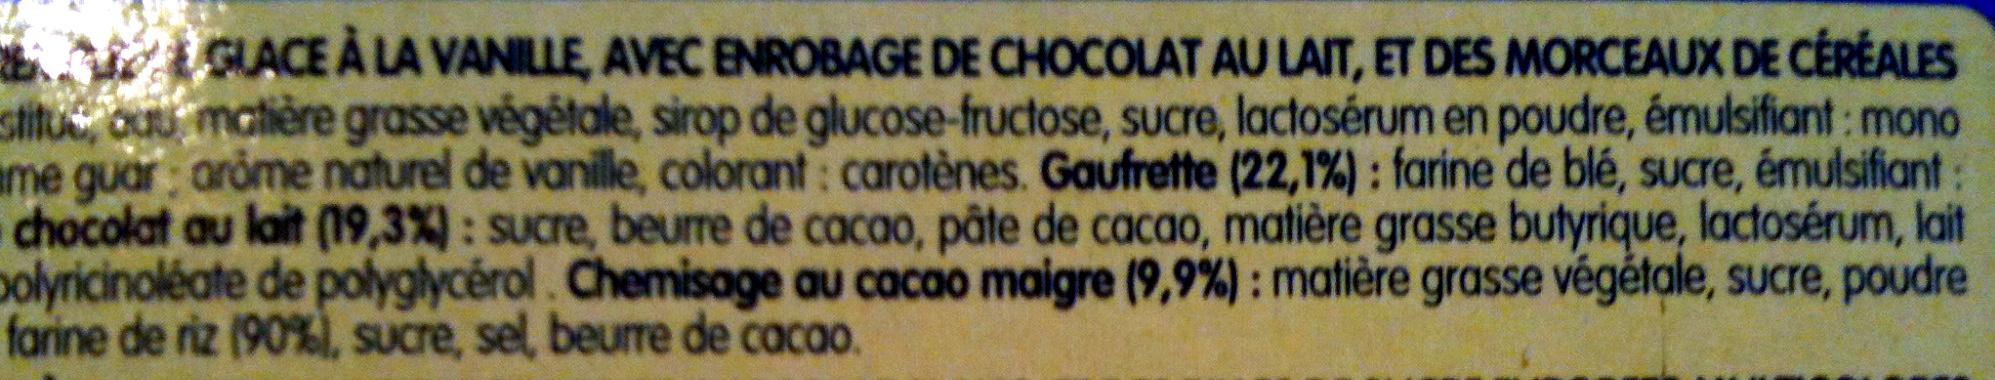 MiniCônes Vanille - Ingrediënten